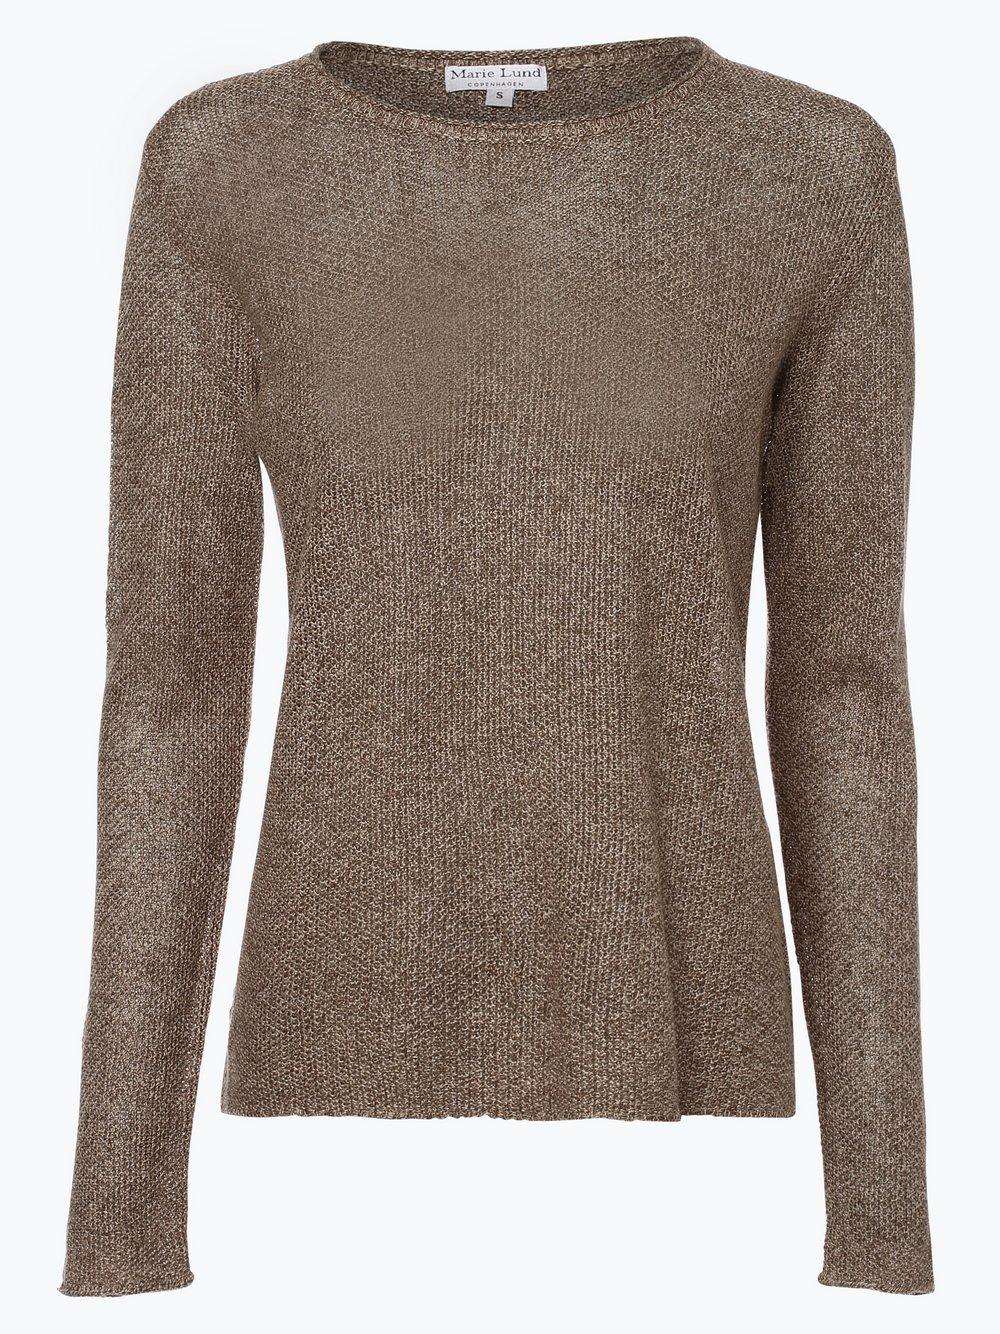 quality design cfdda 87b86 Damen Pullover aus Leinen